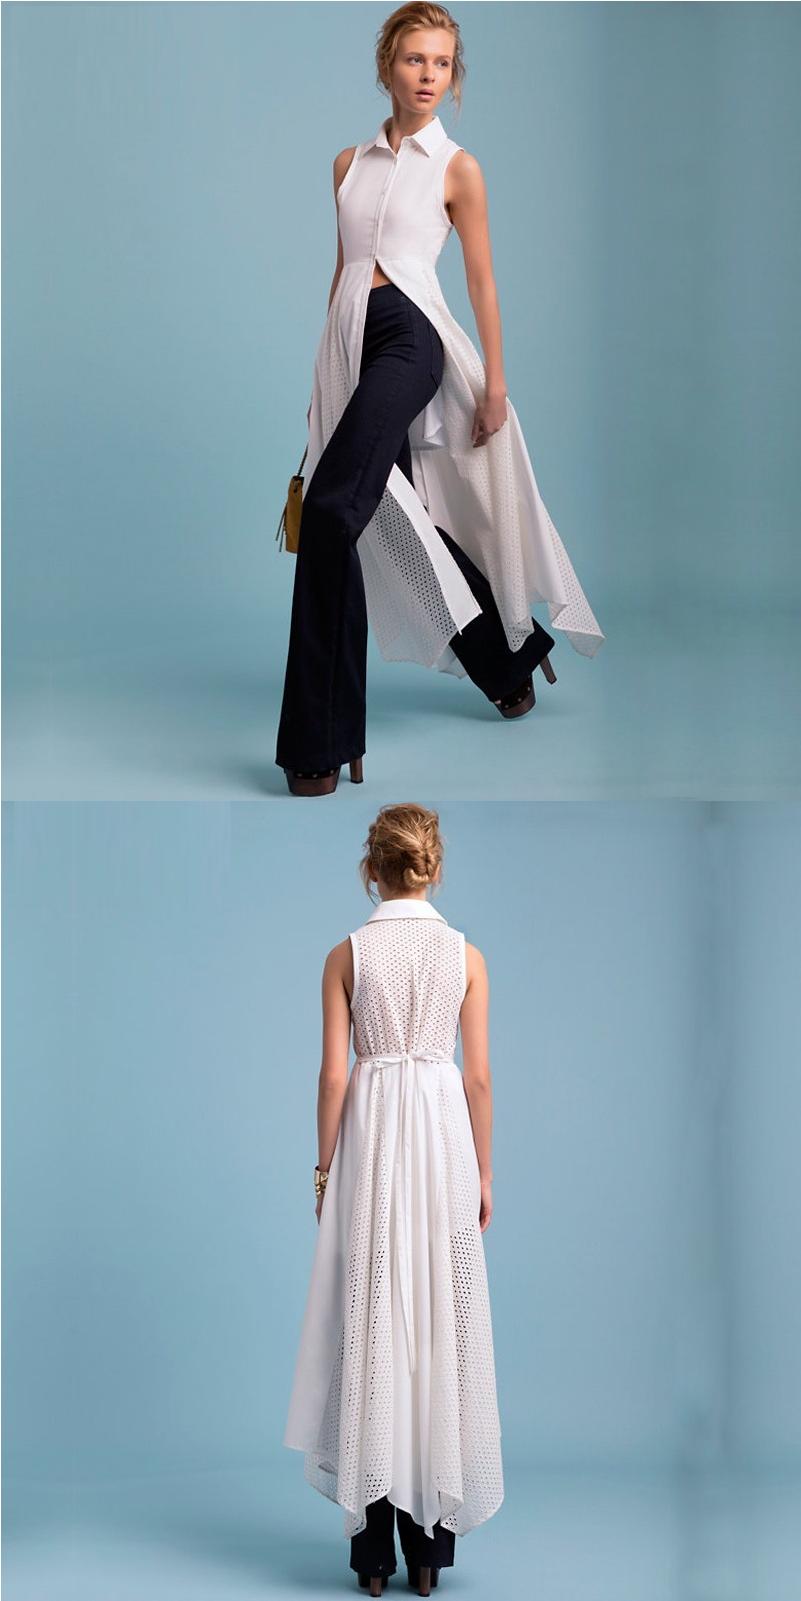 Summer new fashion long dress women c l o t h e s pinterest